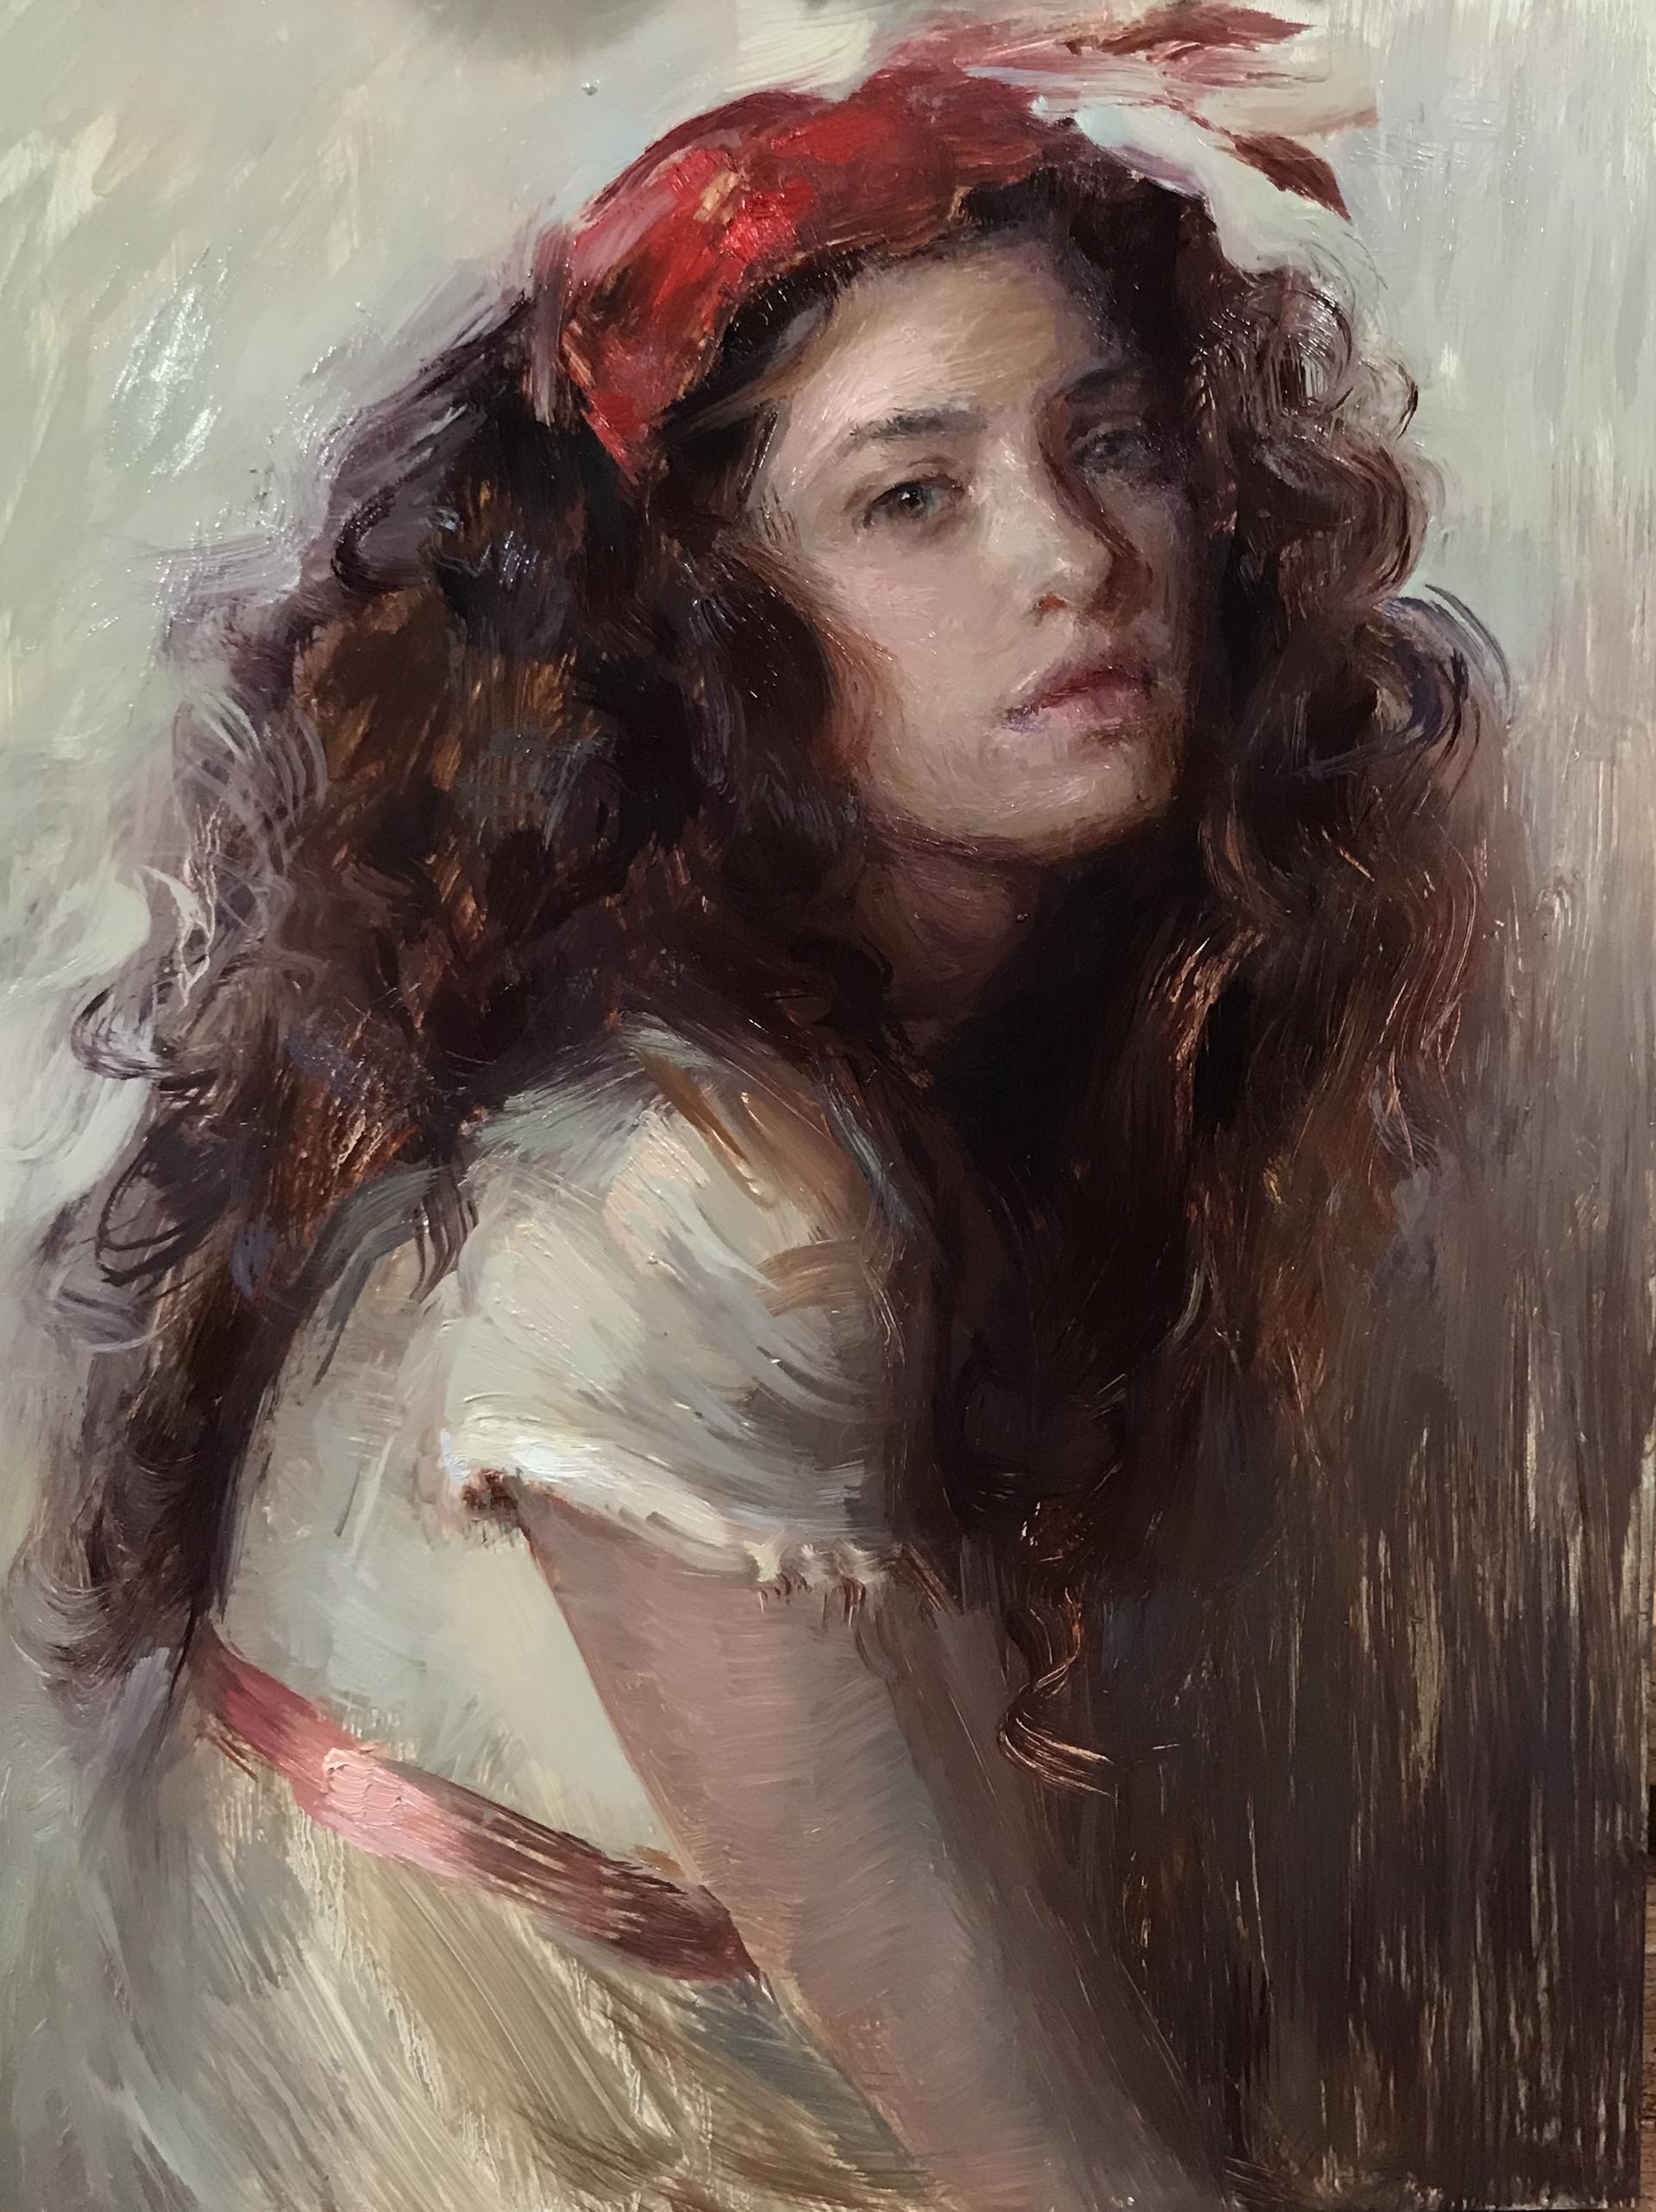 Posing in Curls by Suchitra Bhosle